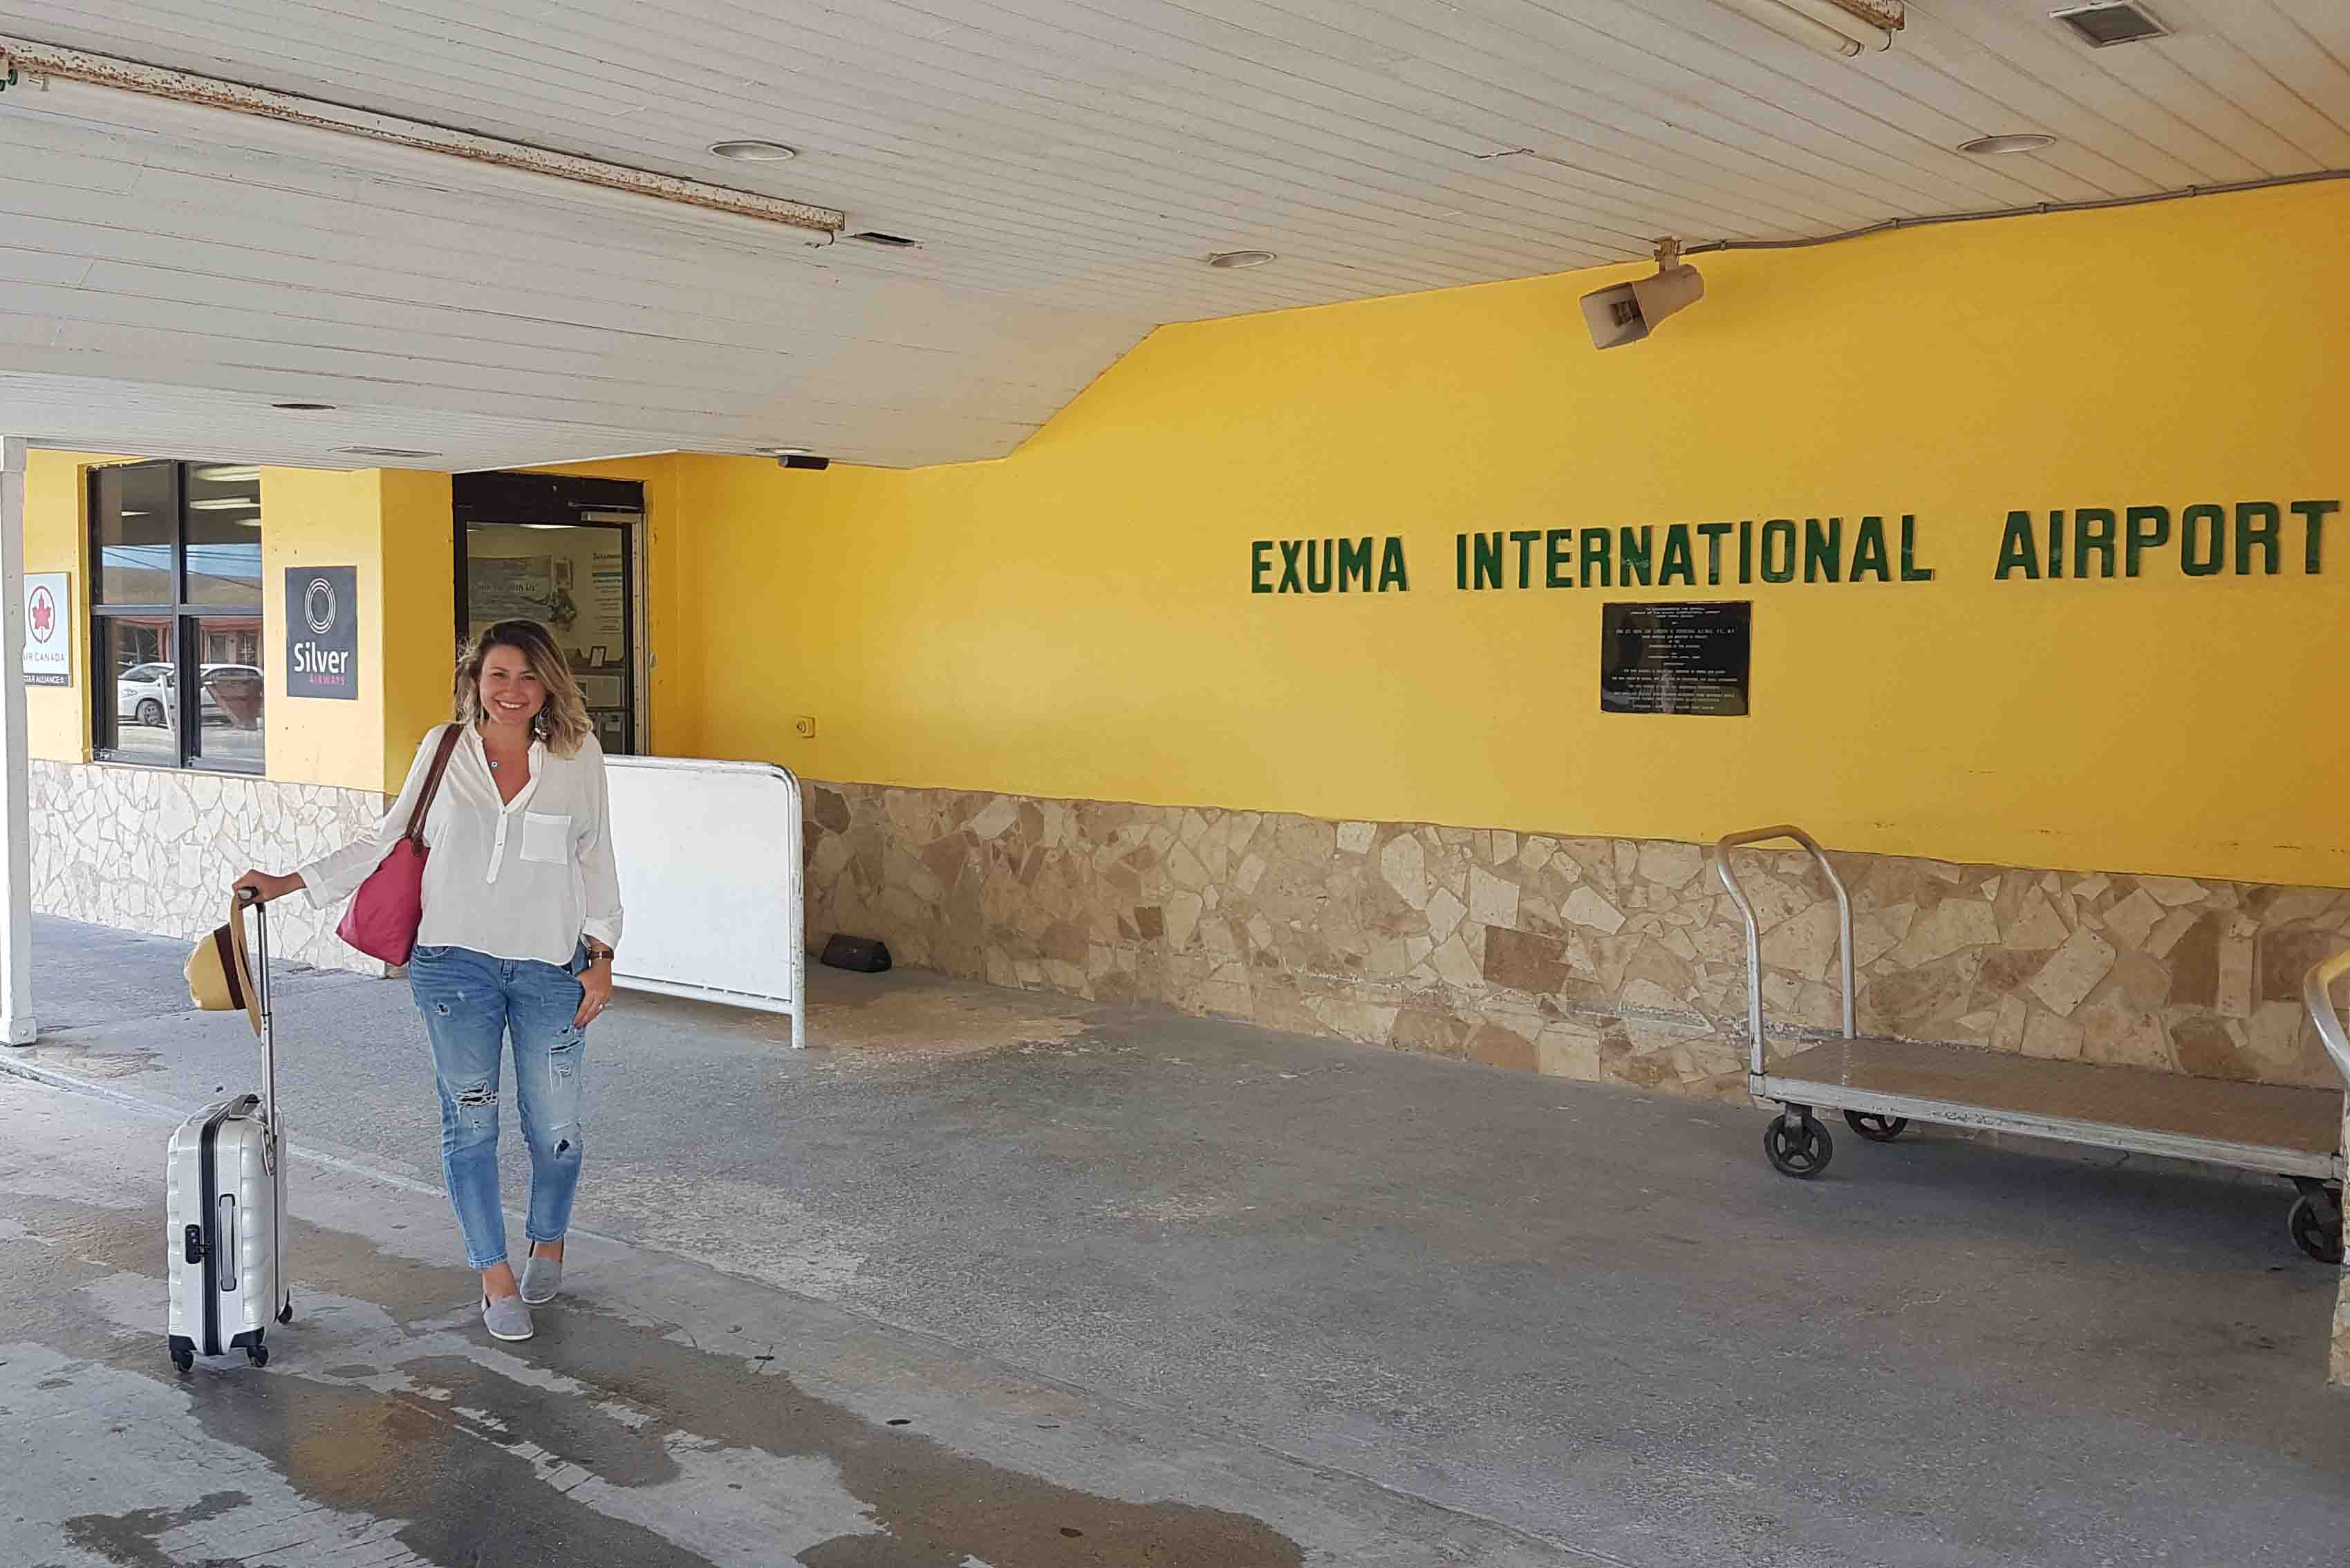 Aeroporto Internacional de Exuma